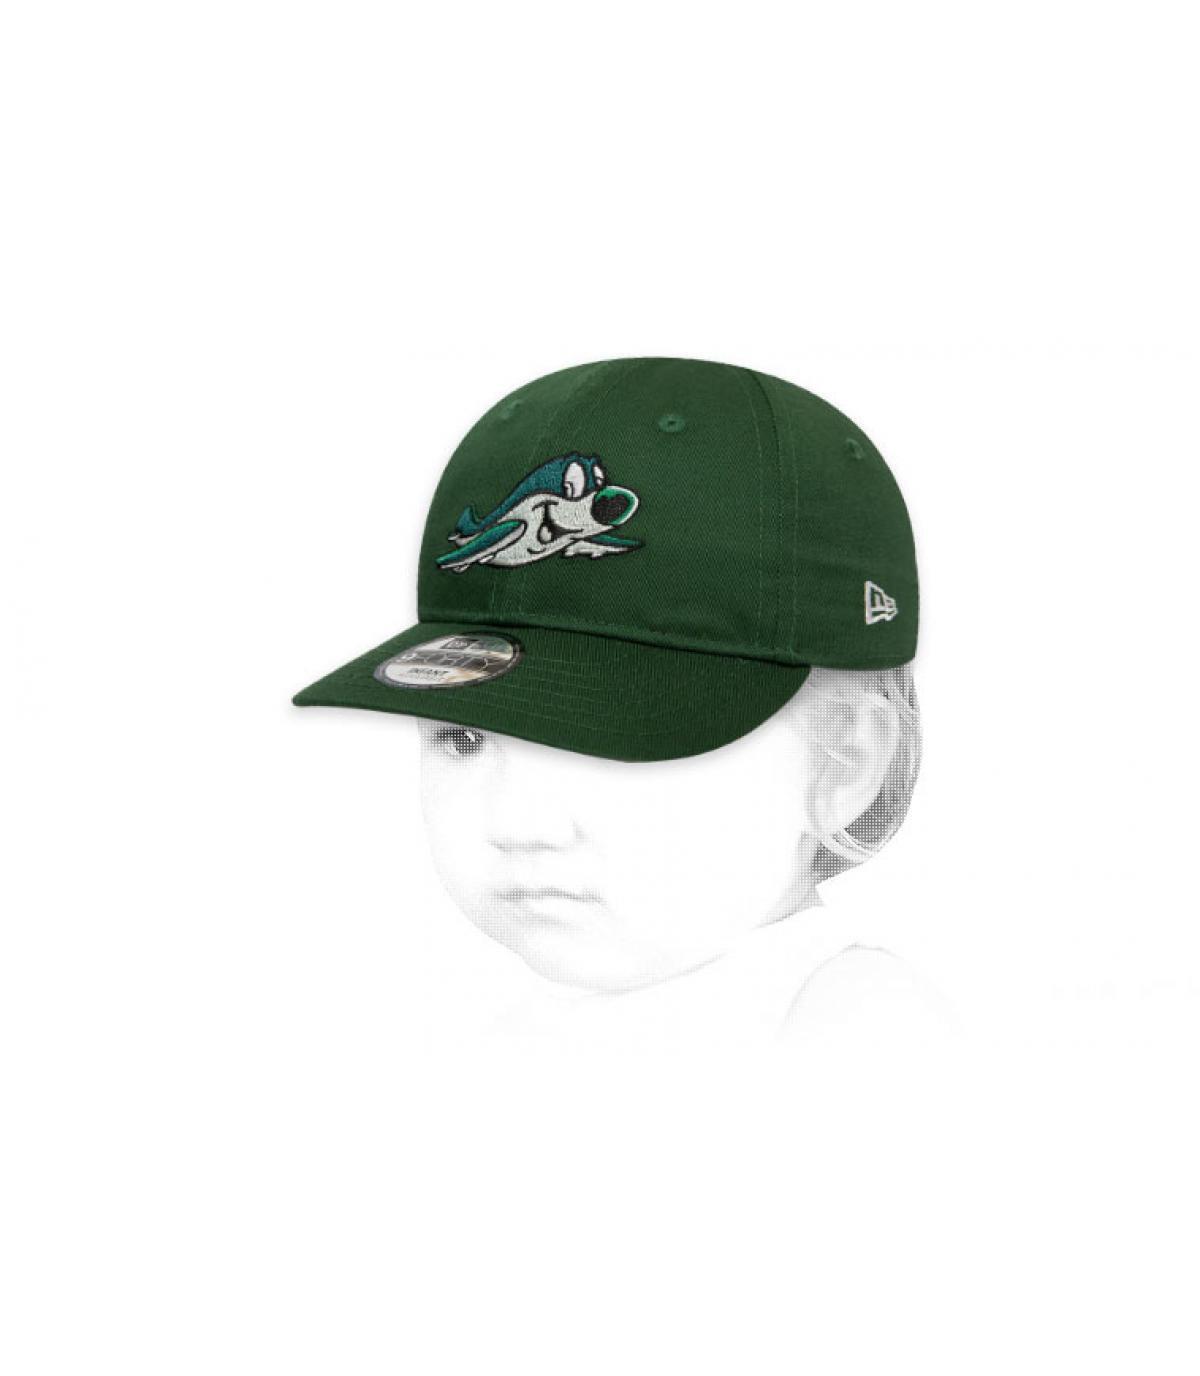 casquette Jets bébé vert